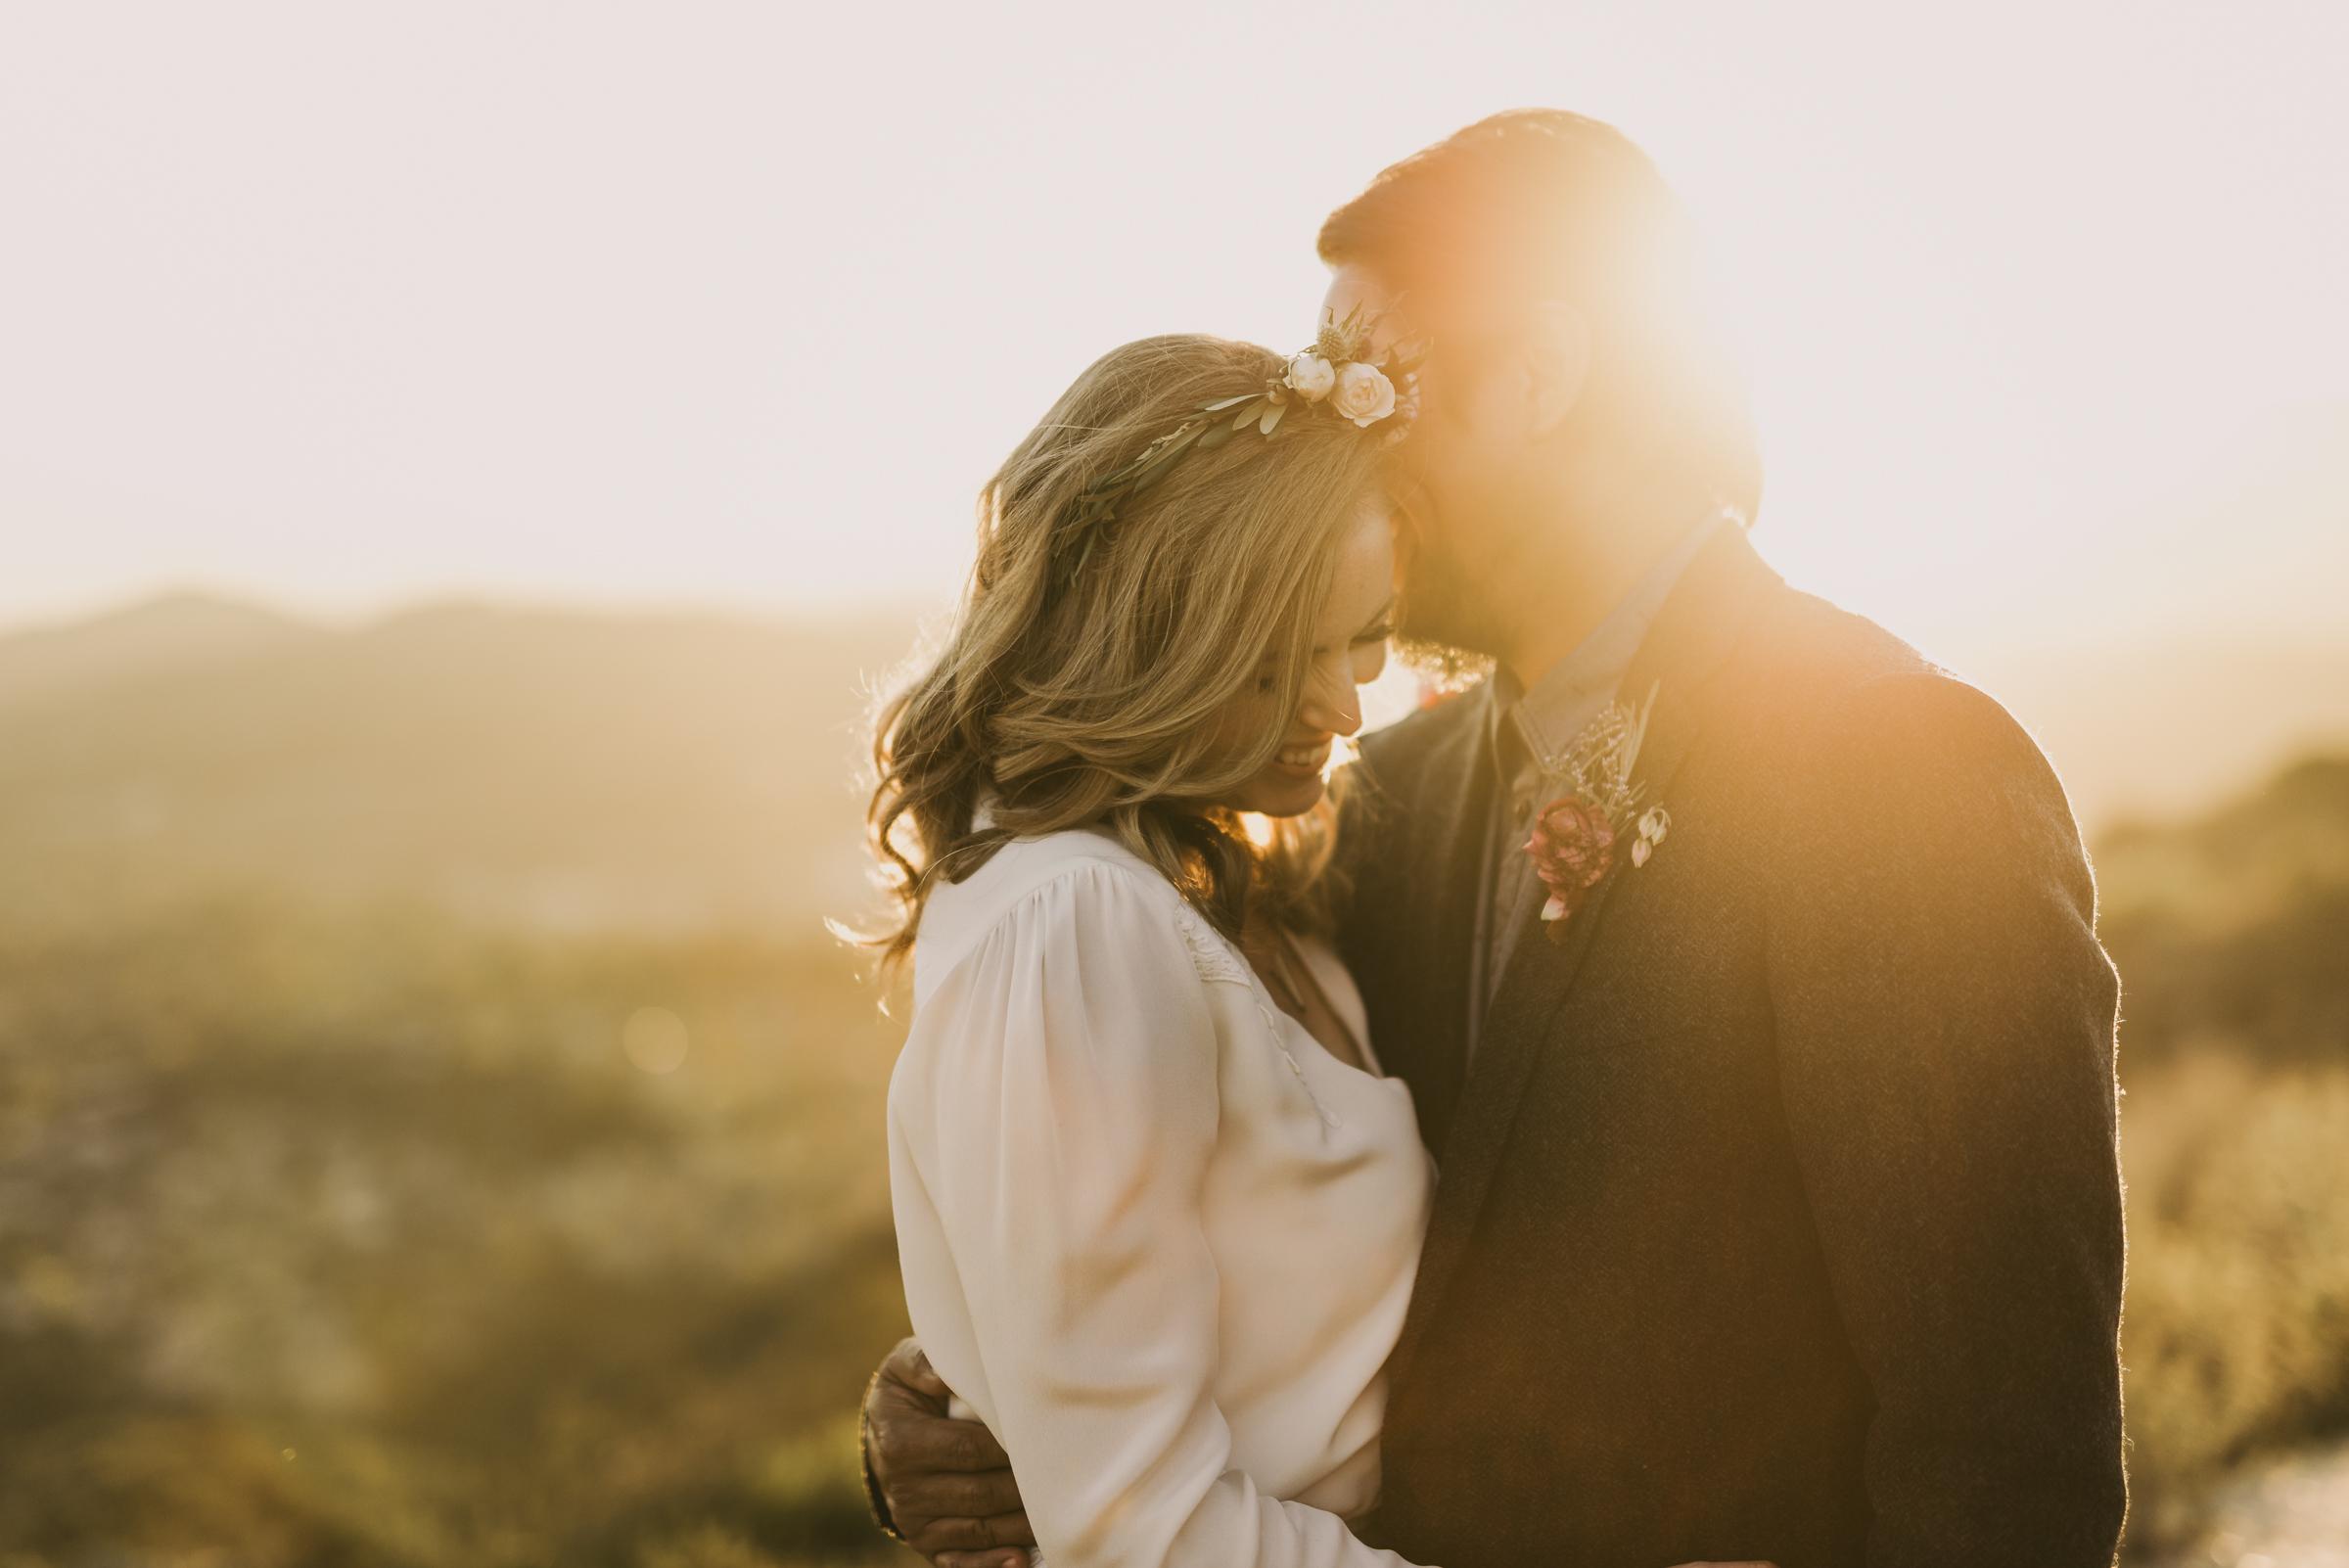 ©Isaiah + Taylor Photography - Intimate Elopement, Eaton Canyon, Los Angeles Wedding Photographer-73.jpg